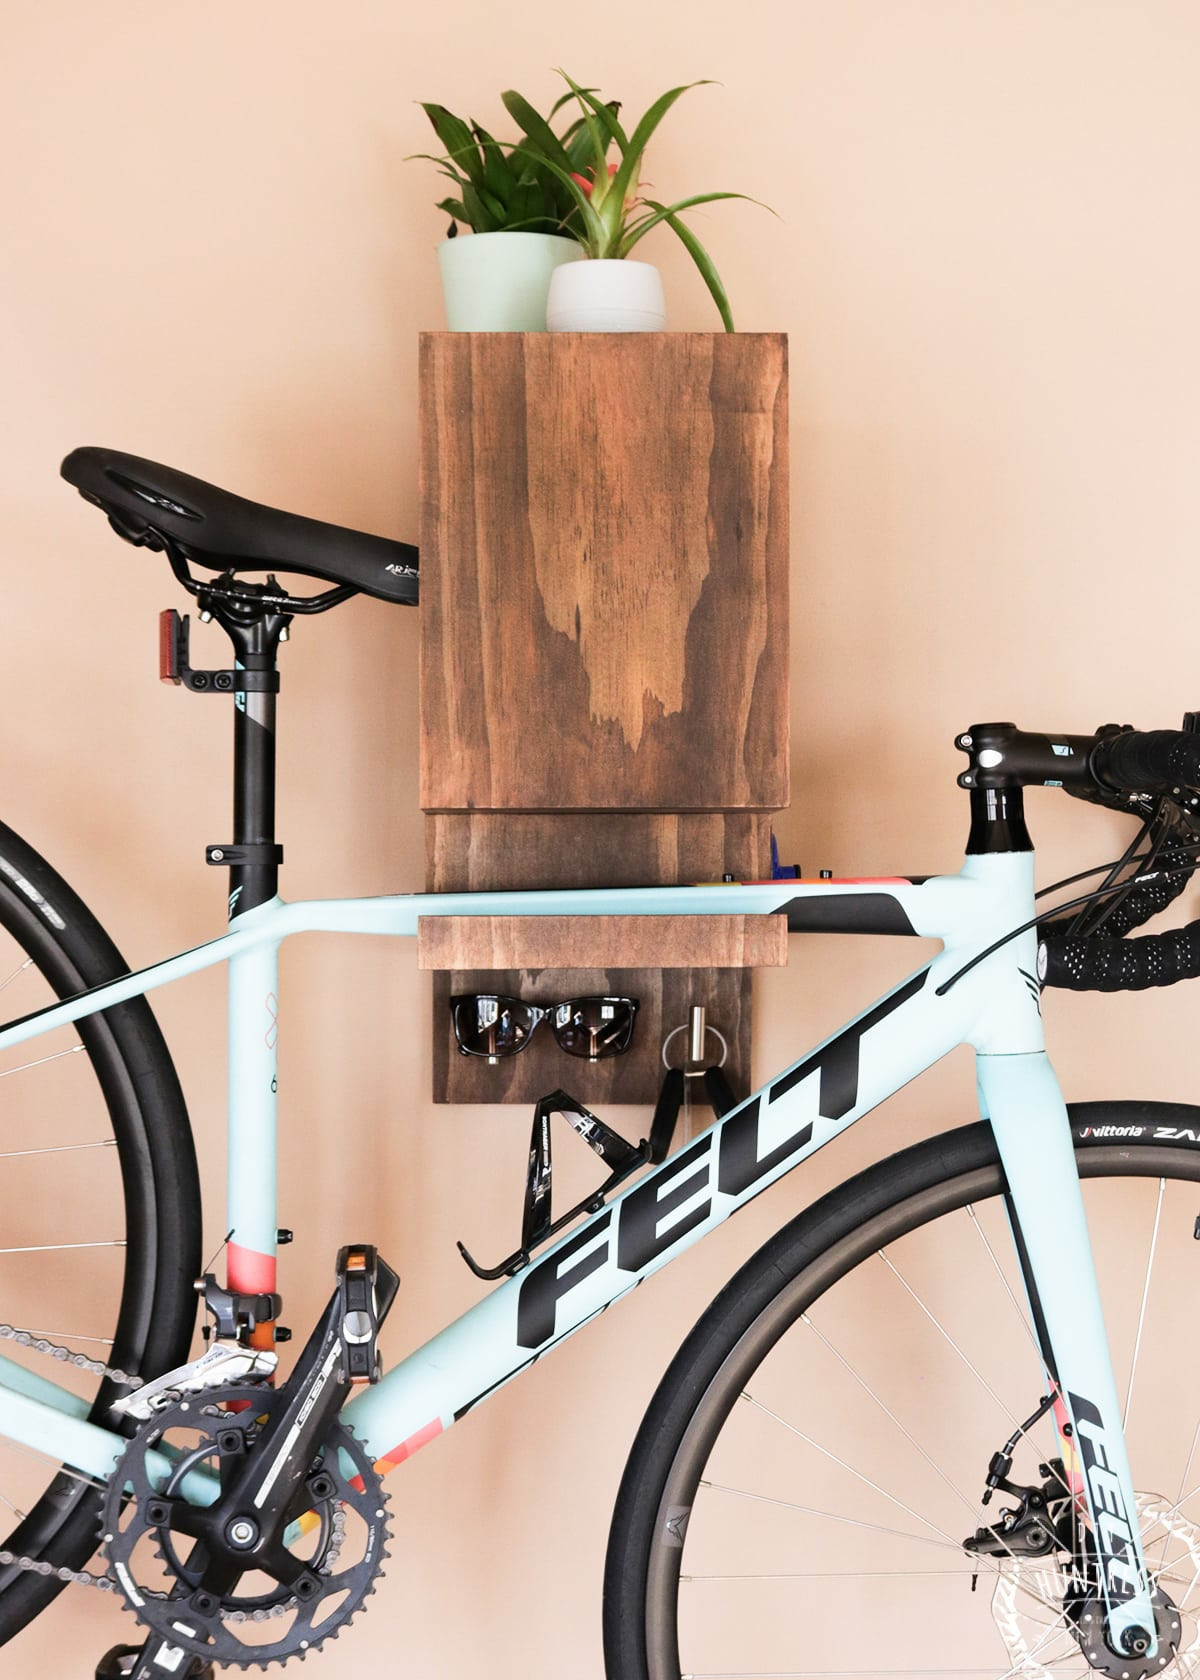 Best ideas about Bike Wall Mount DIY . Save or Pin DIY Wall Mounted Bike Rack DIY Huntress Now.